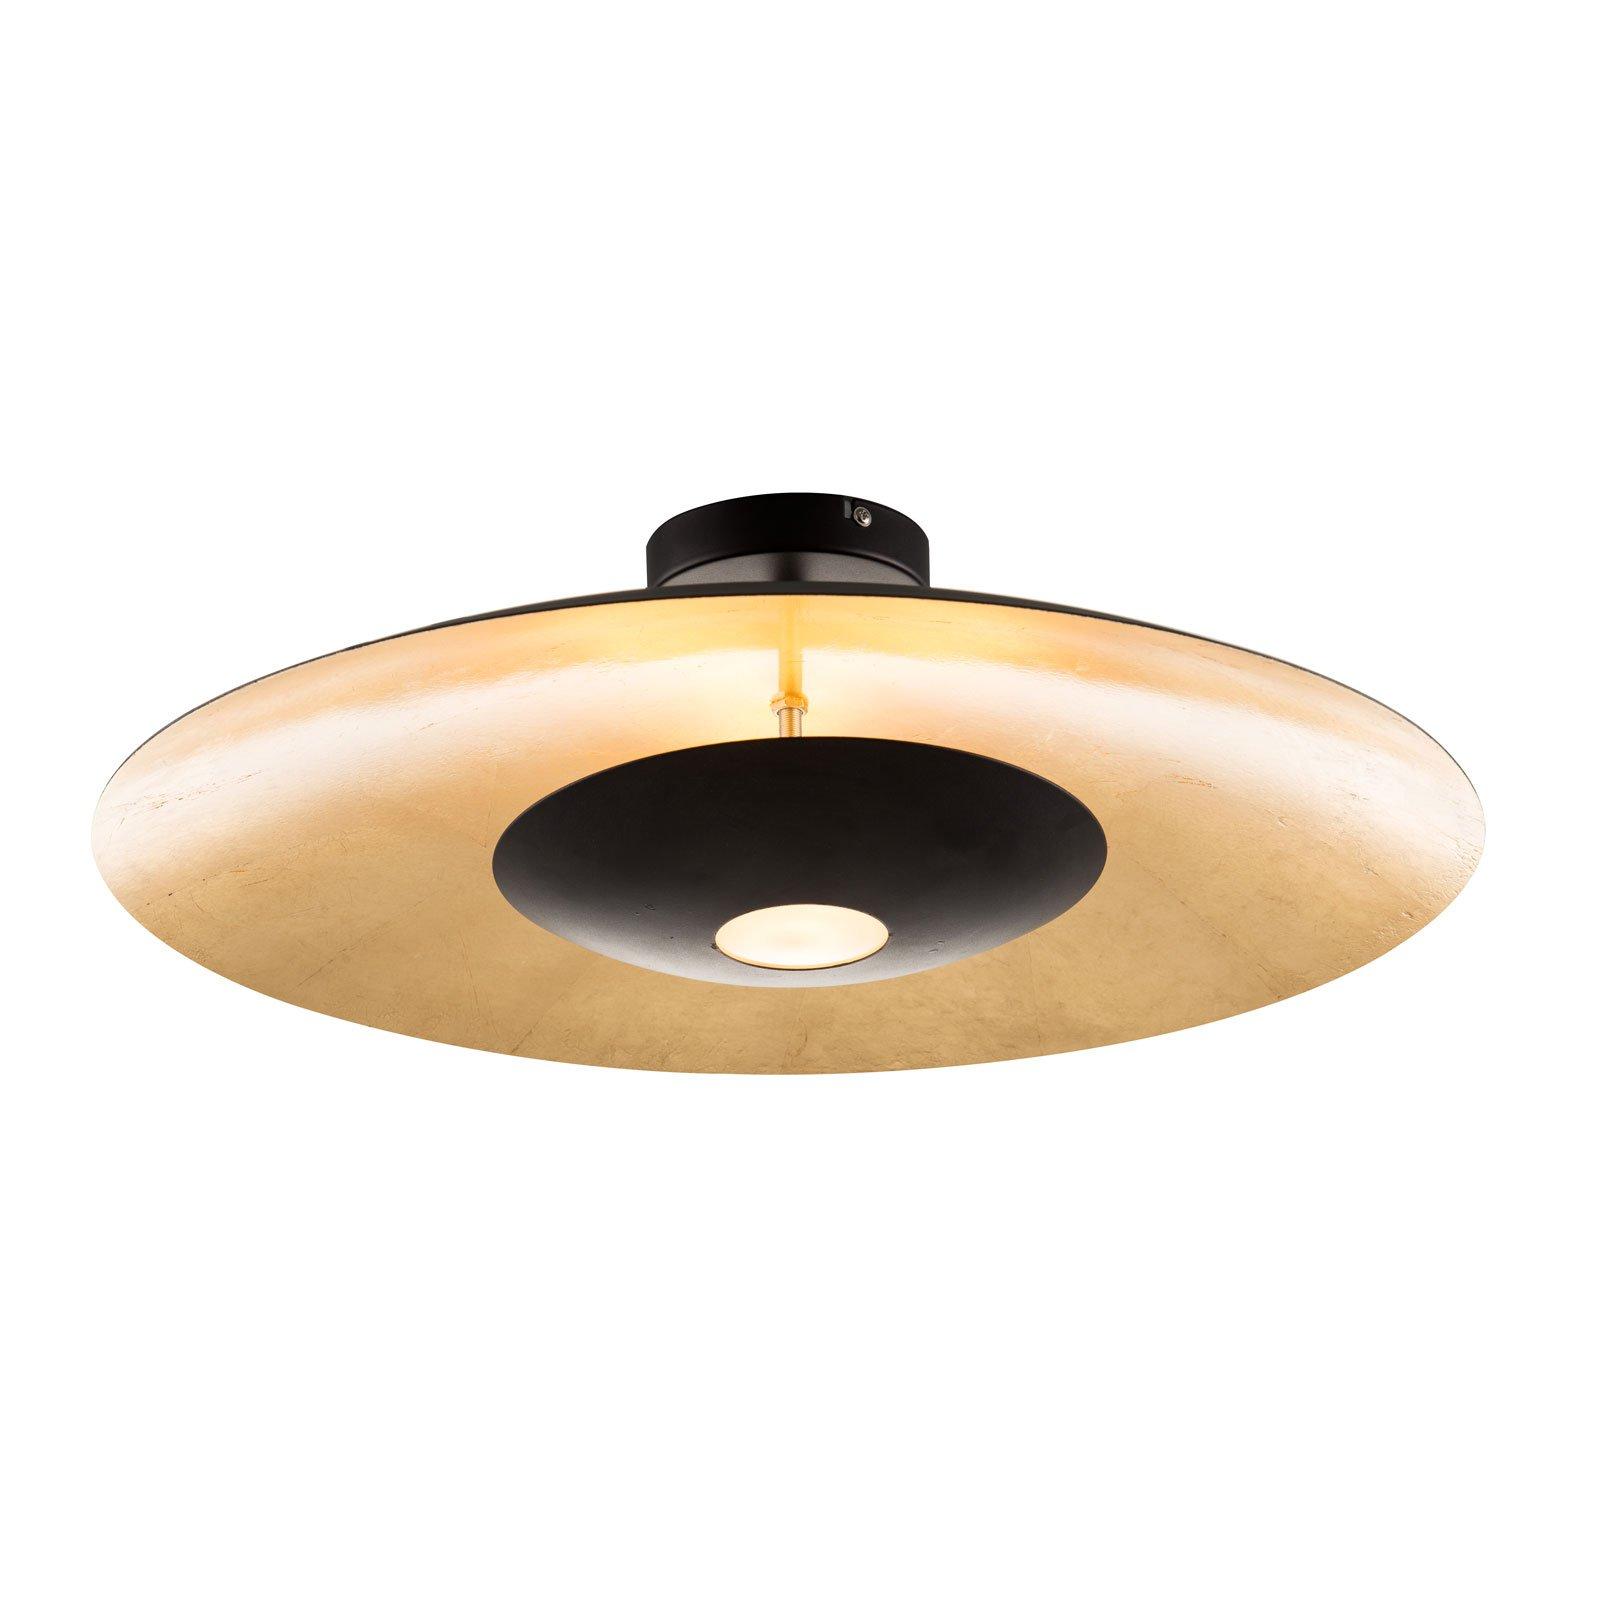 LED-taklampe Minas i svart gull, dimbar